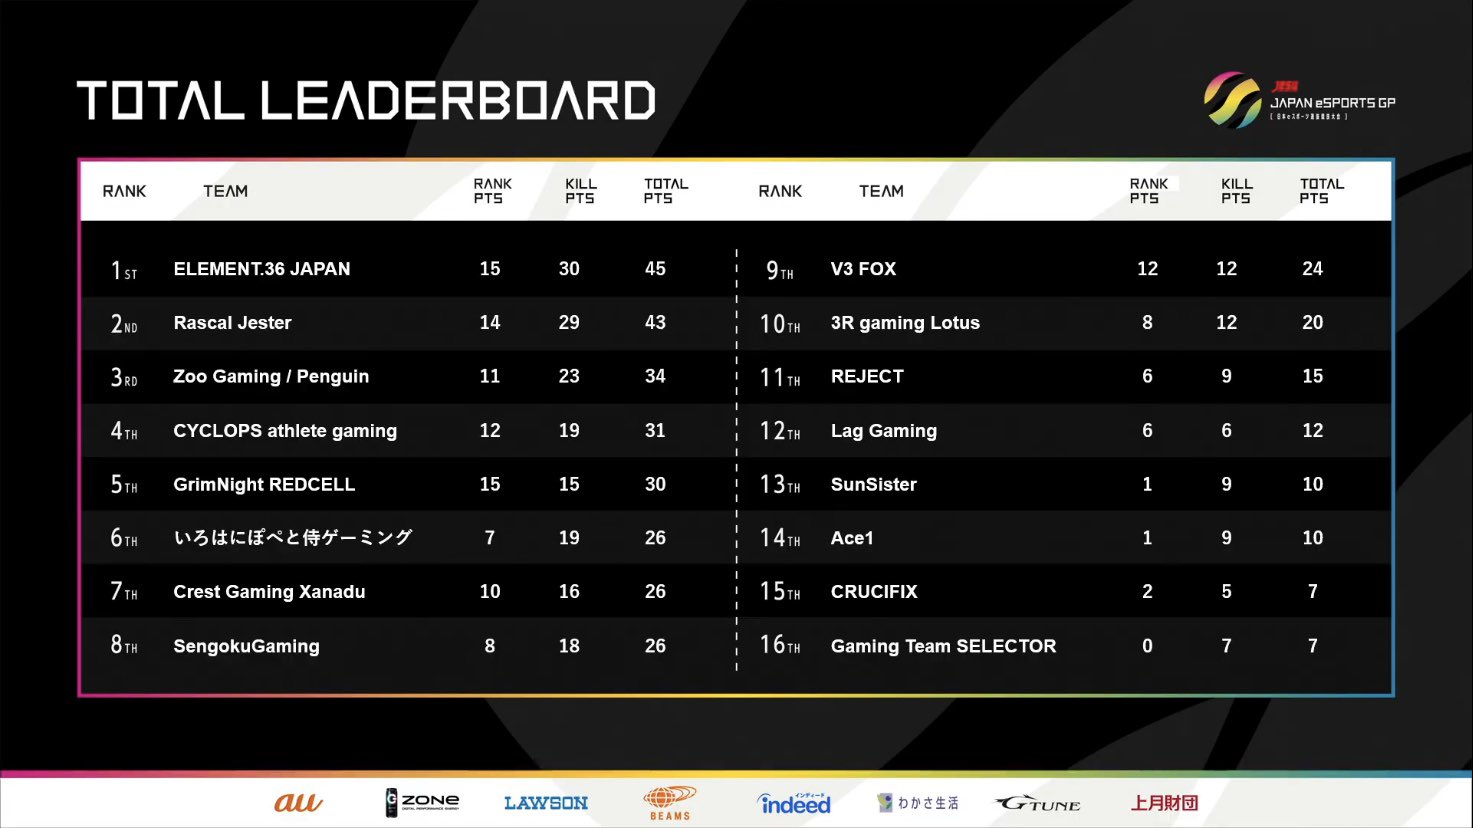 『ELEMENT.36 JAPAN』【PUBG部門】JeSU JAPAN eSPORTS GRAND PRIX PUBG 日本代表選考会結果報告